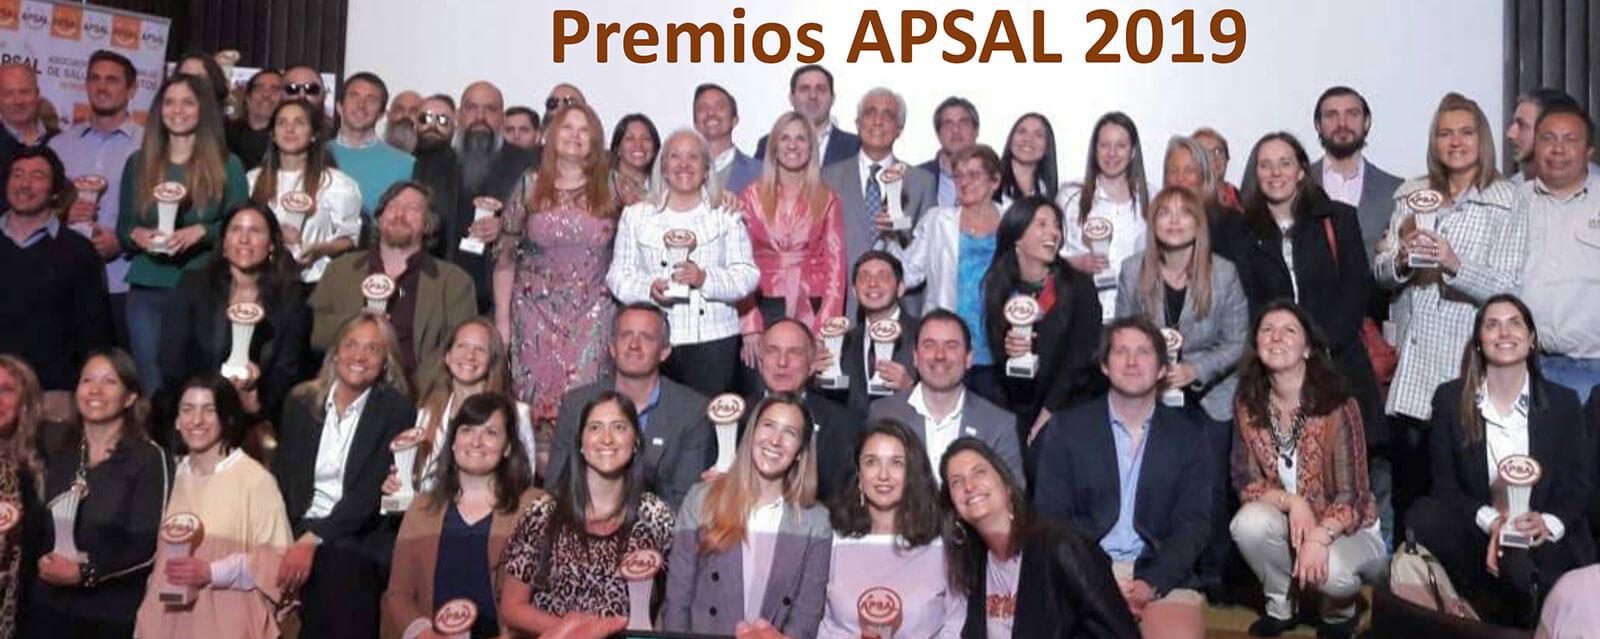 premios-apsal-2019